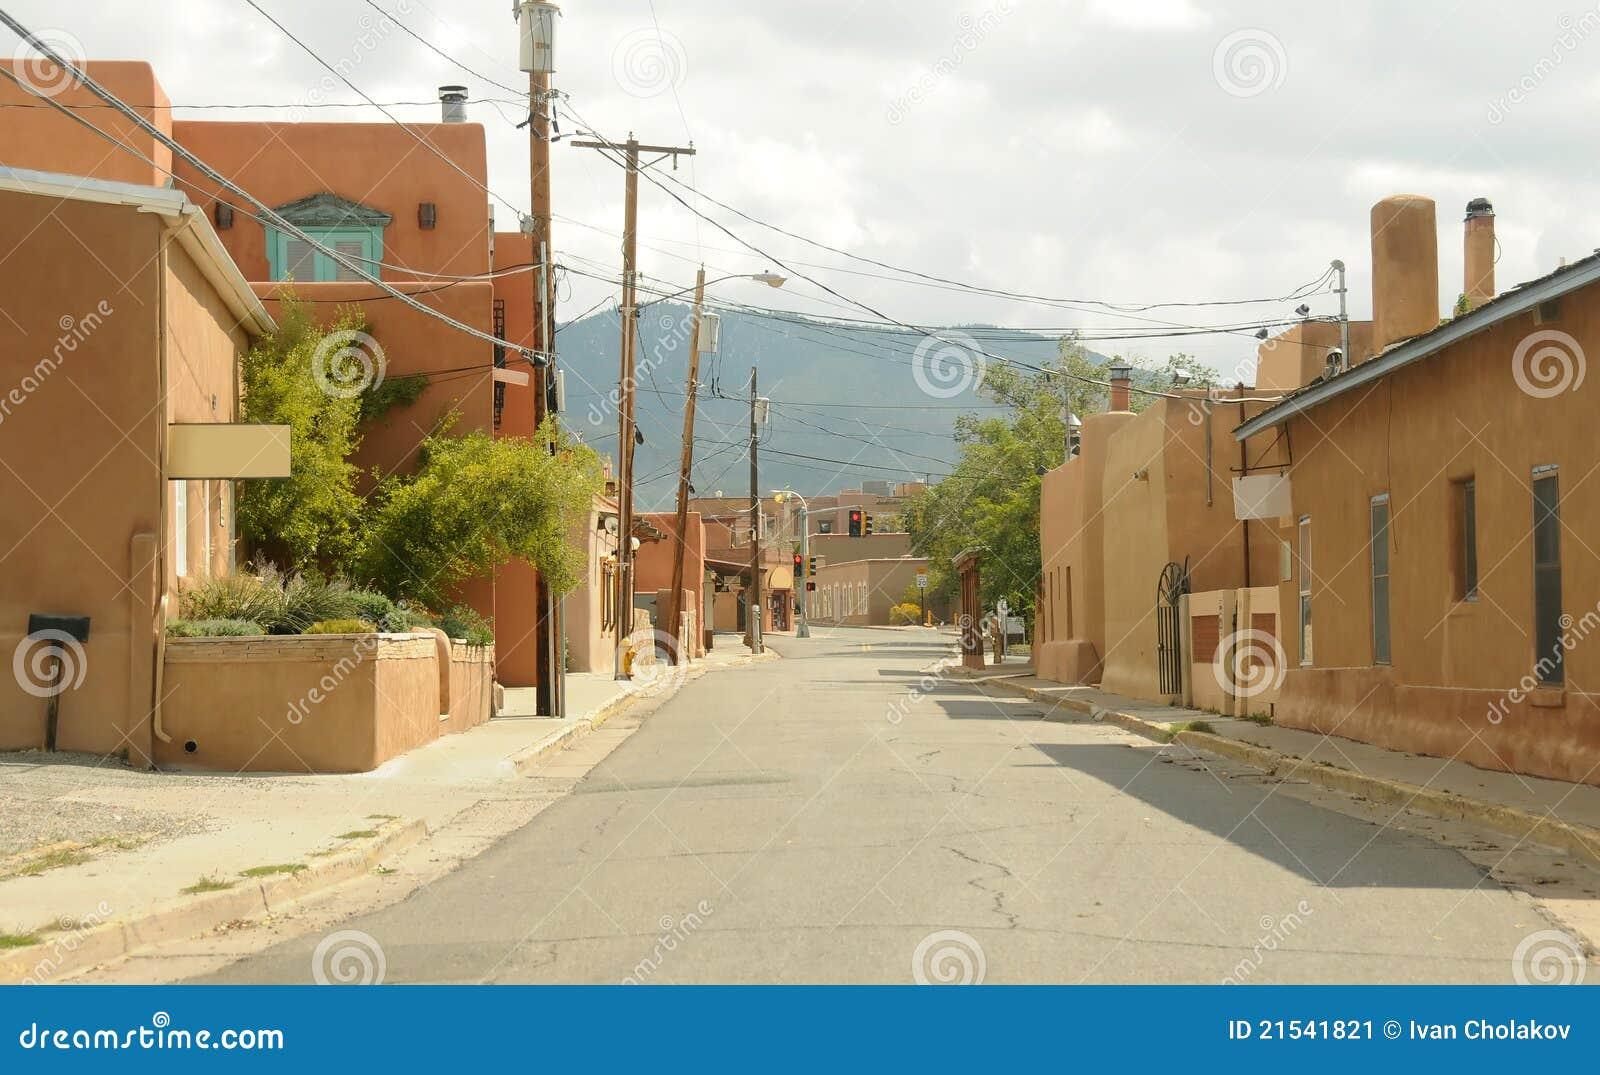 Old Town Santa Fe >> Old Town Santa Fe Stock Image Image Of Town City